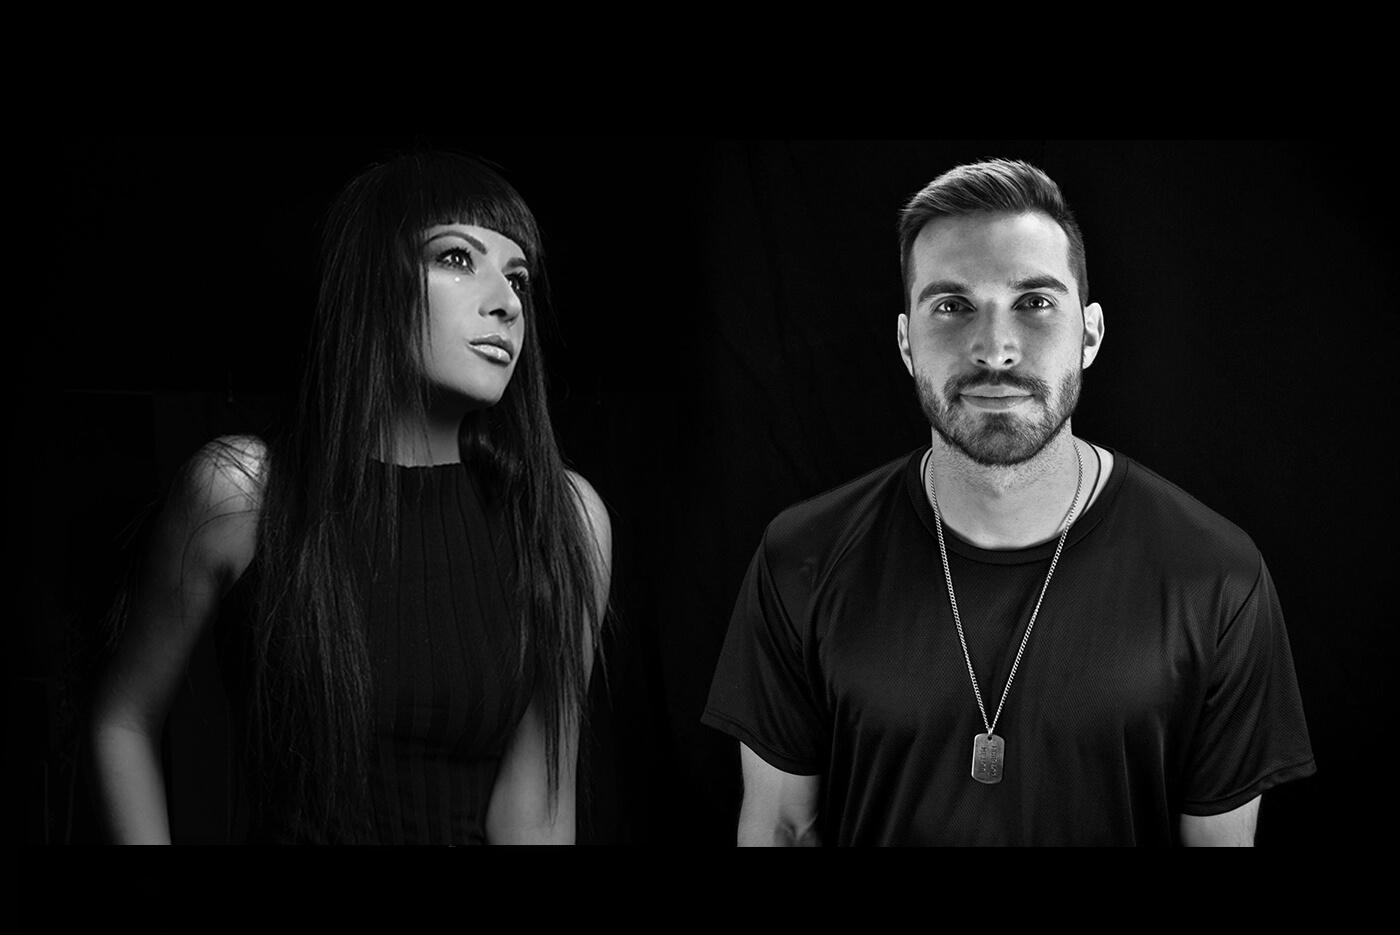 PREMIERE: Fatima Hajji – YKN (Metodi Hristov Remix)